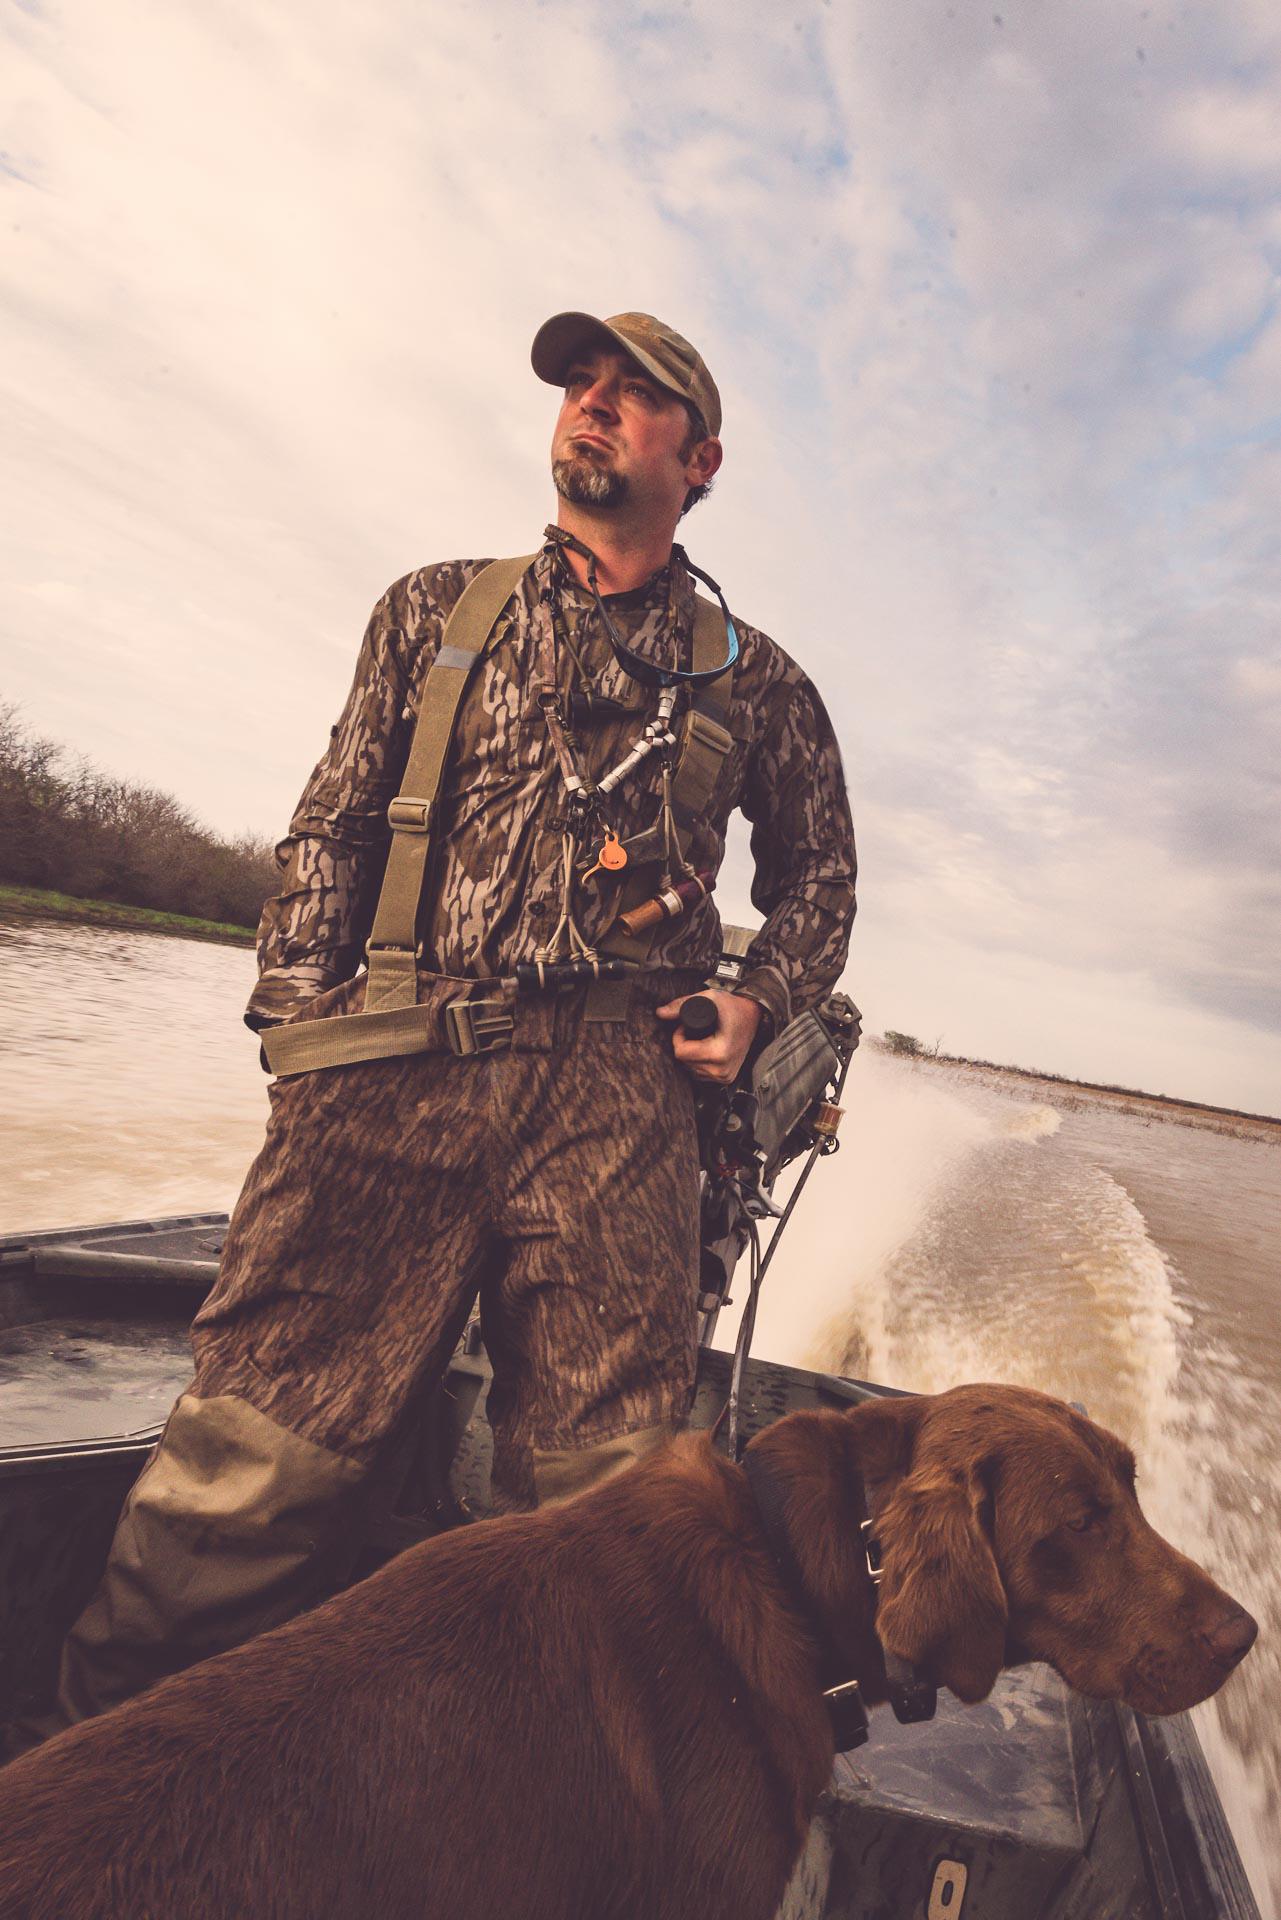 Richard and his dog speeding across the marsh in a boat at Honey Brake. © Tony Bynum